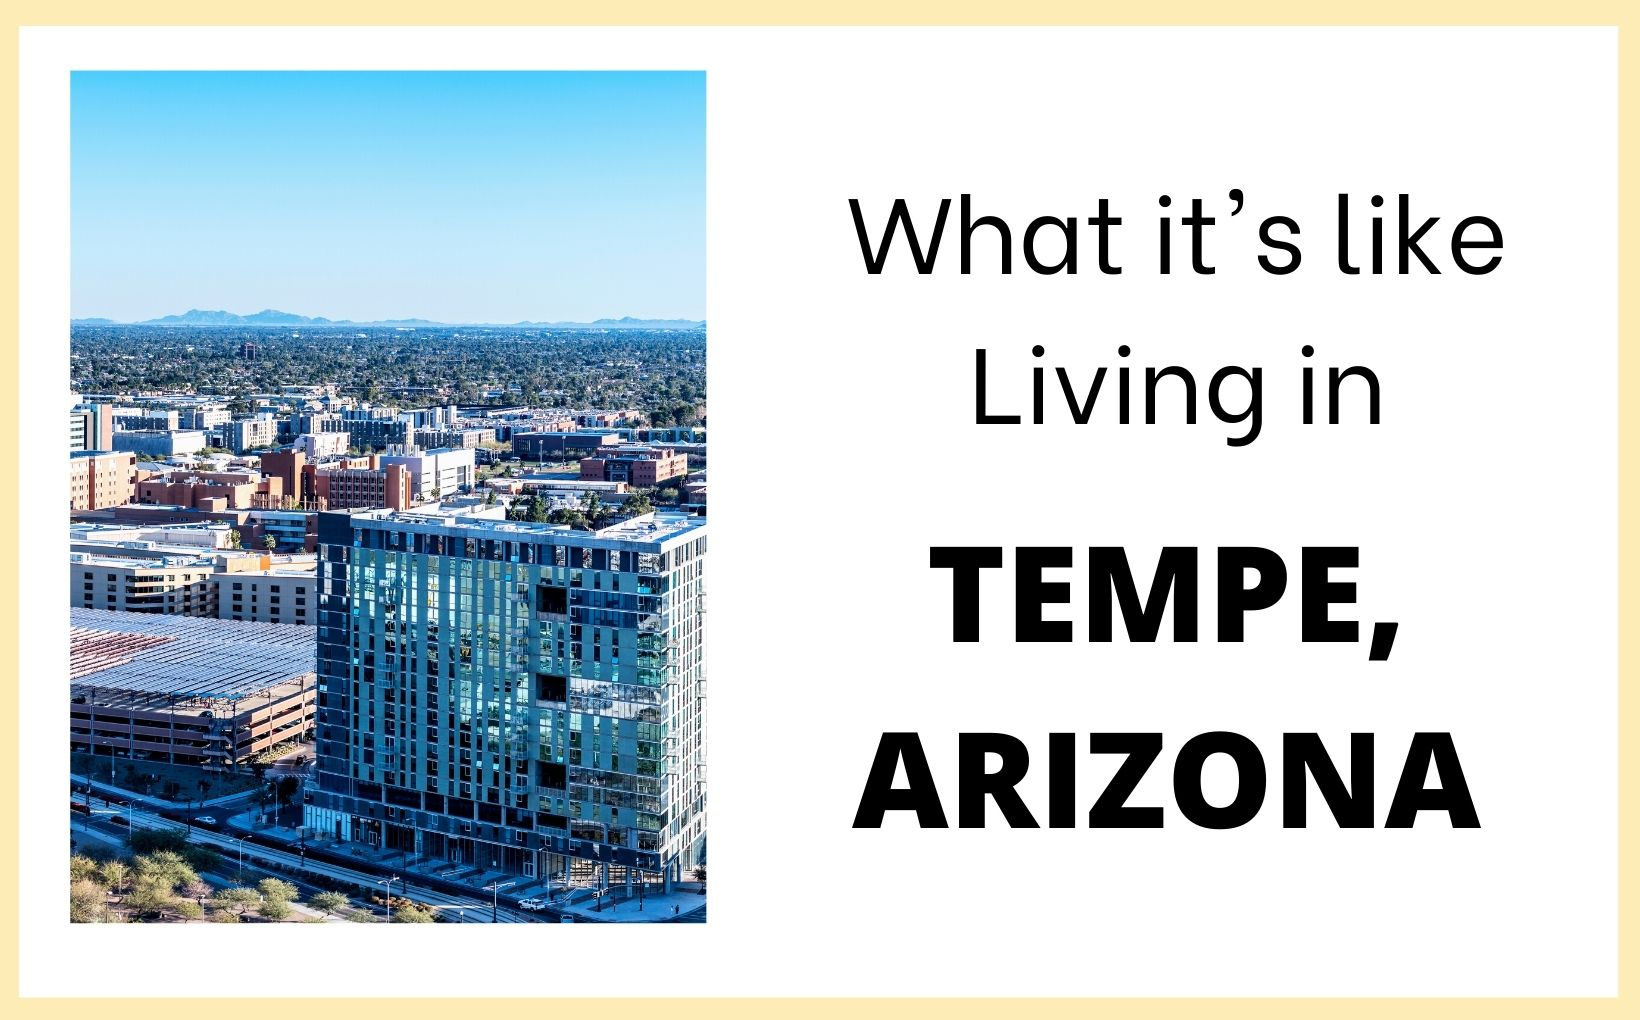 Living in Tempe Arizona feature image